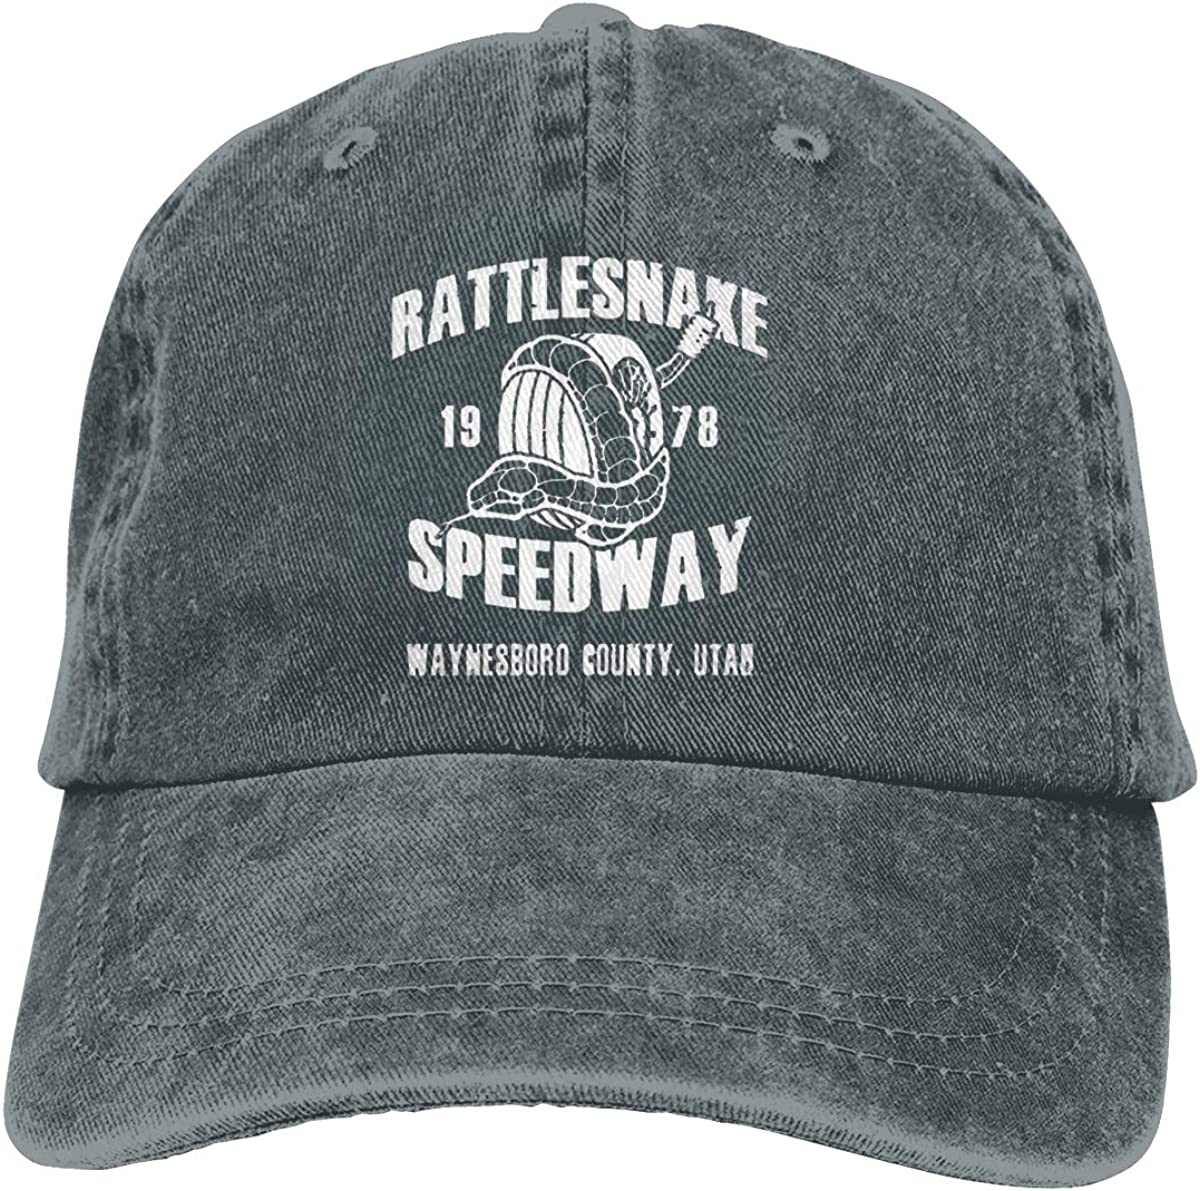 Rattlesnake/1978/Speedway Adjustable Baseball Caps Denim Hats